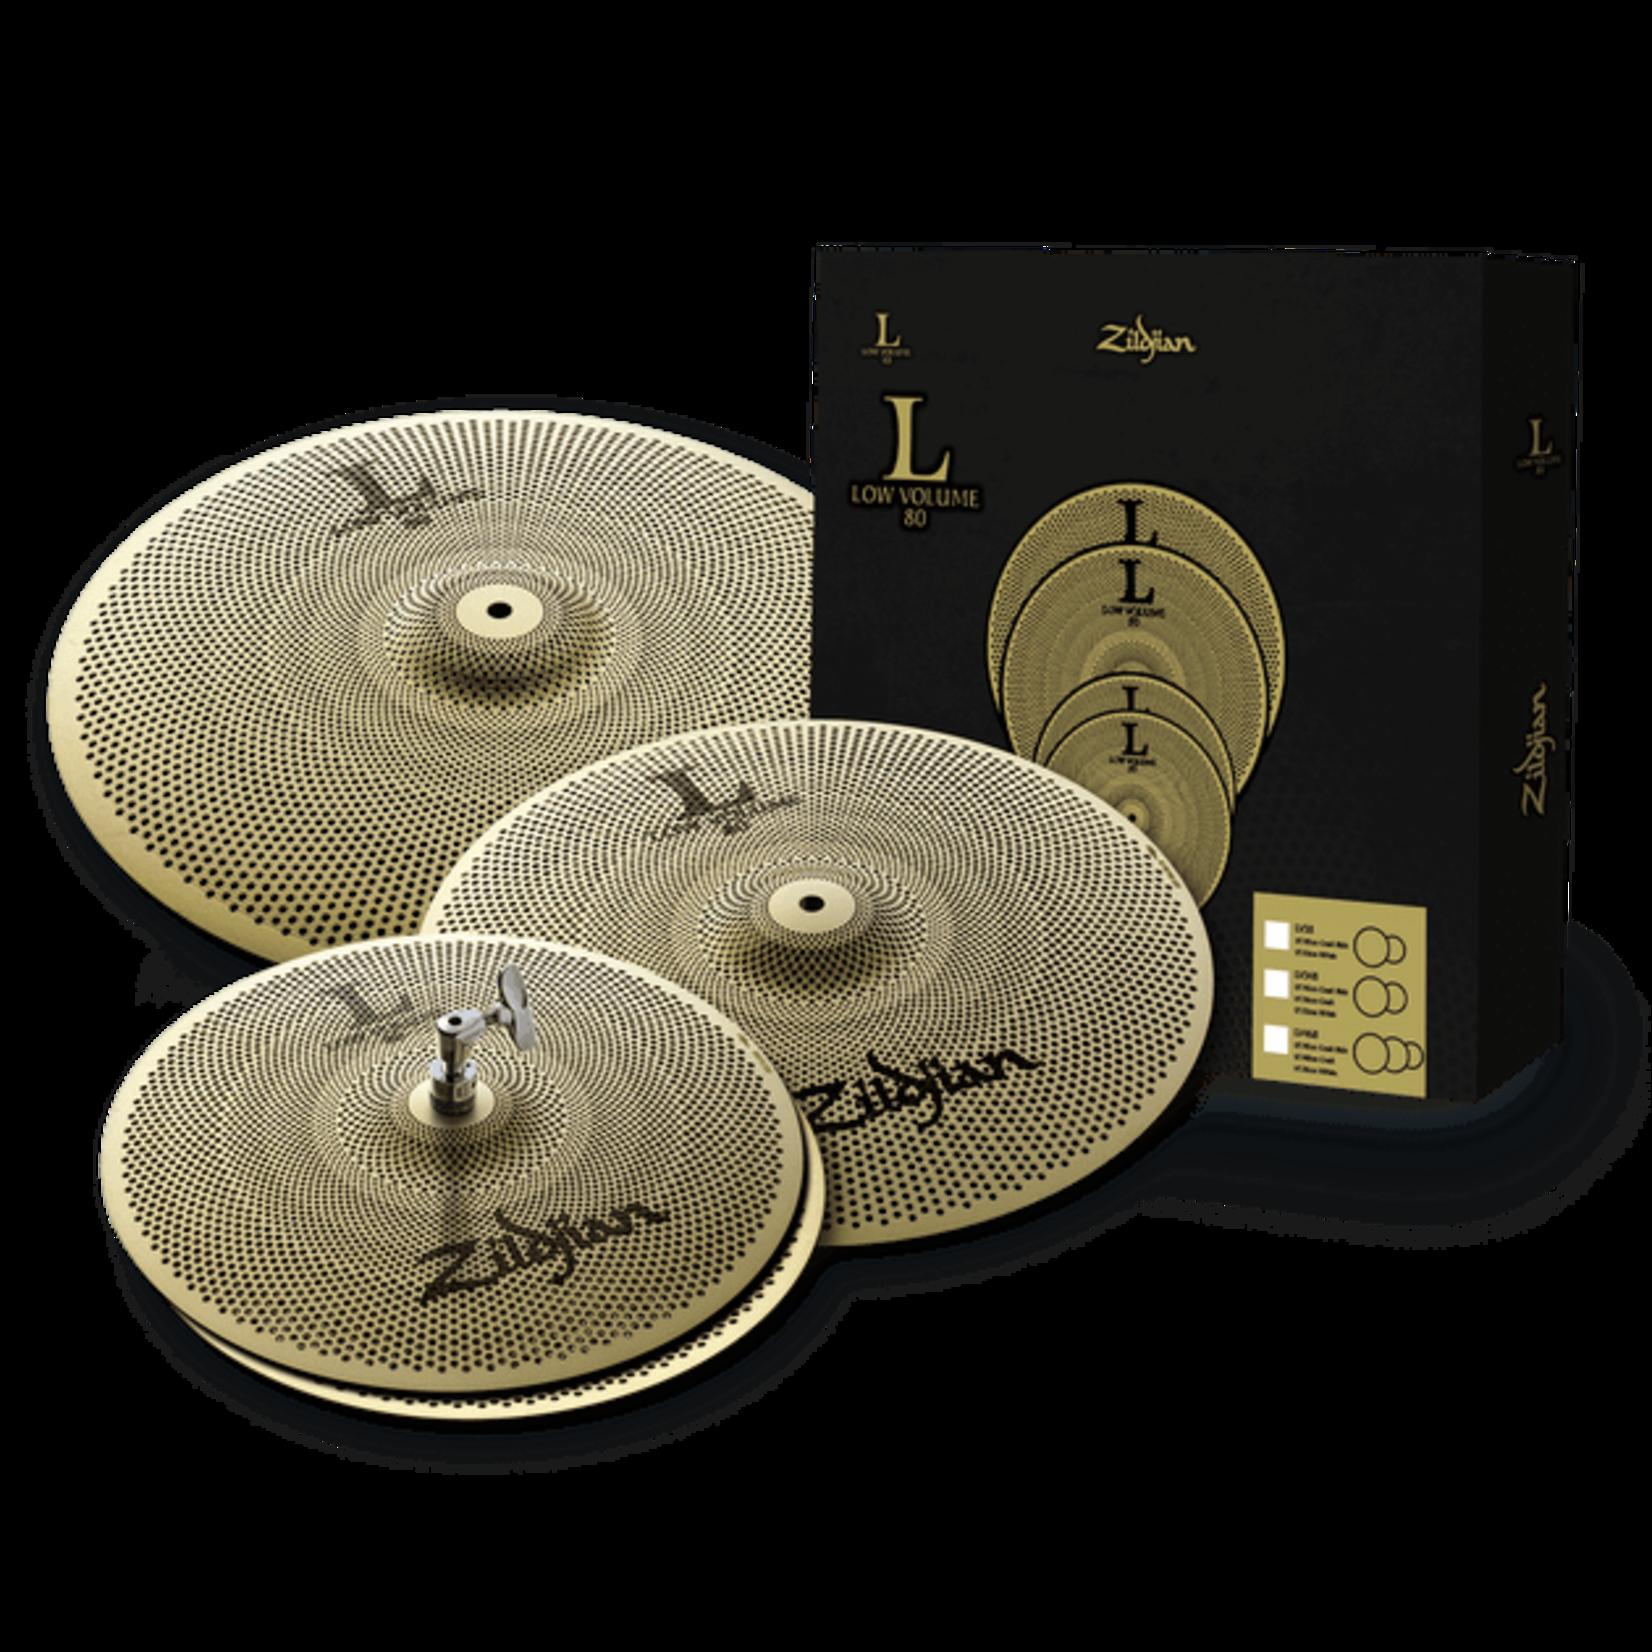 Zildjian Zildjian L80 Low Volume Cymbal Pack - LV468